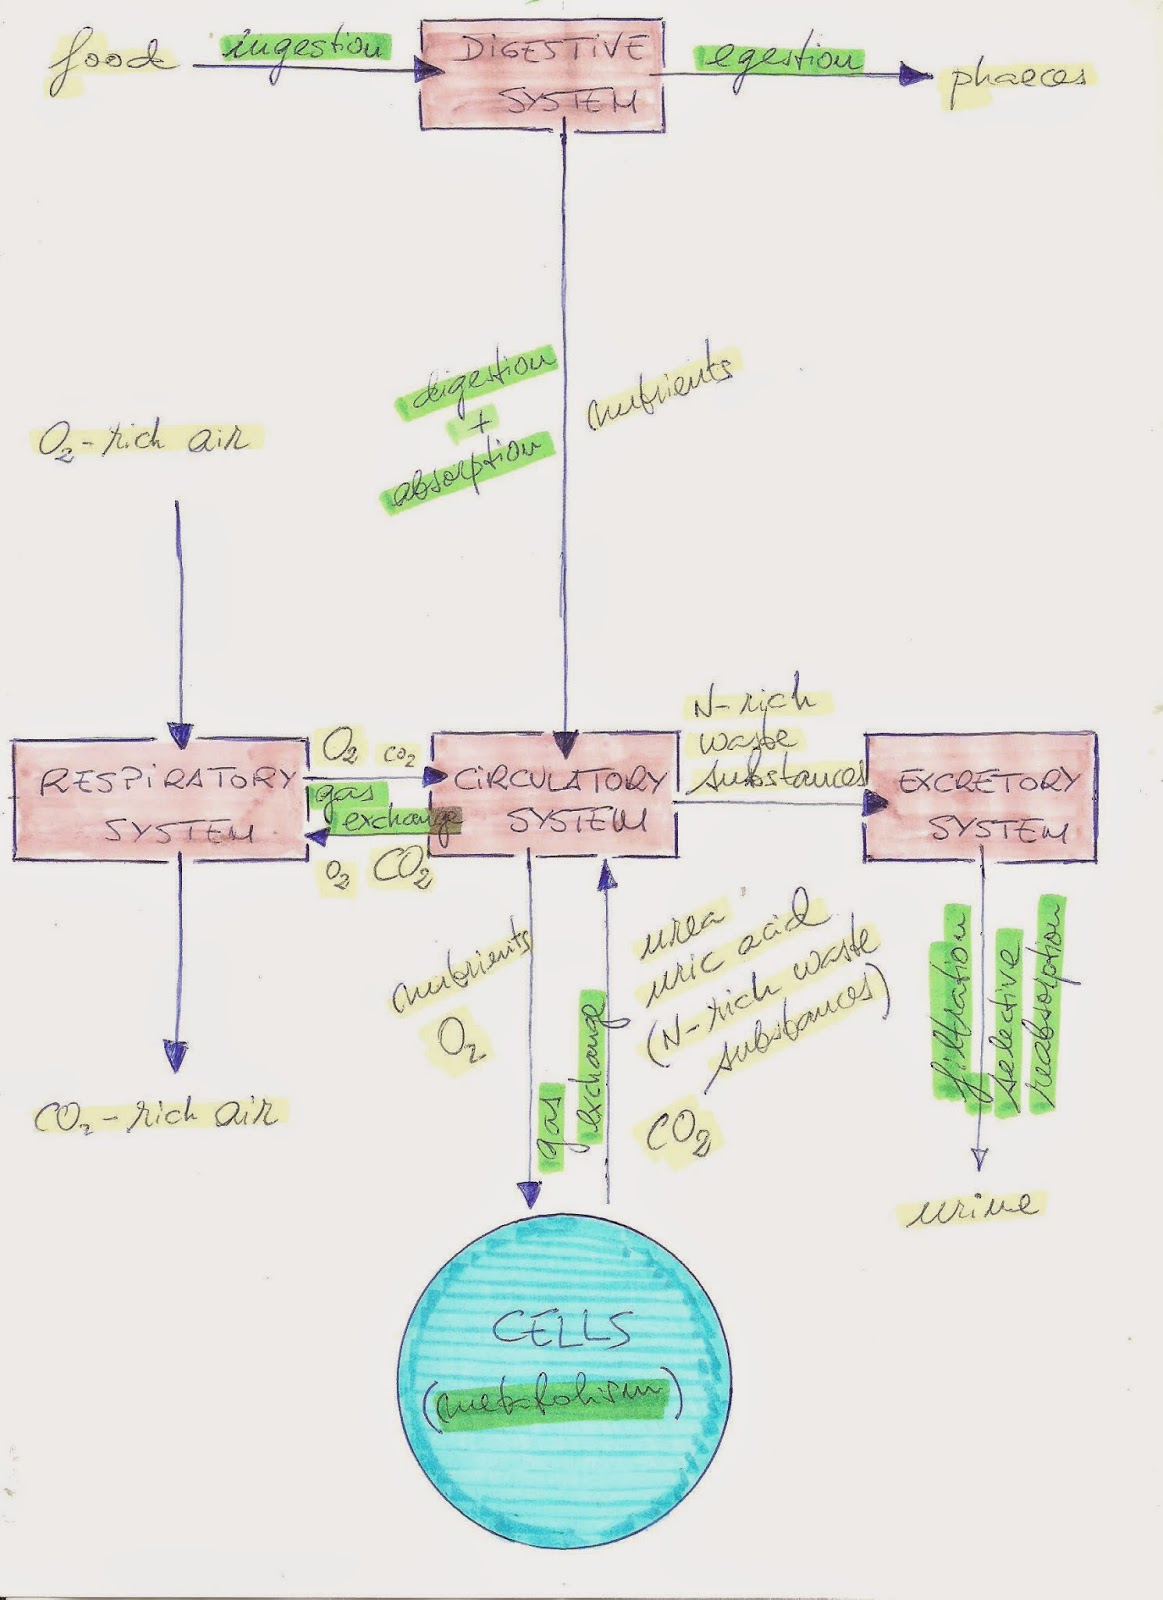 Digestive System Javi Ciencias British